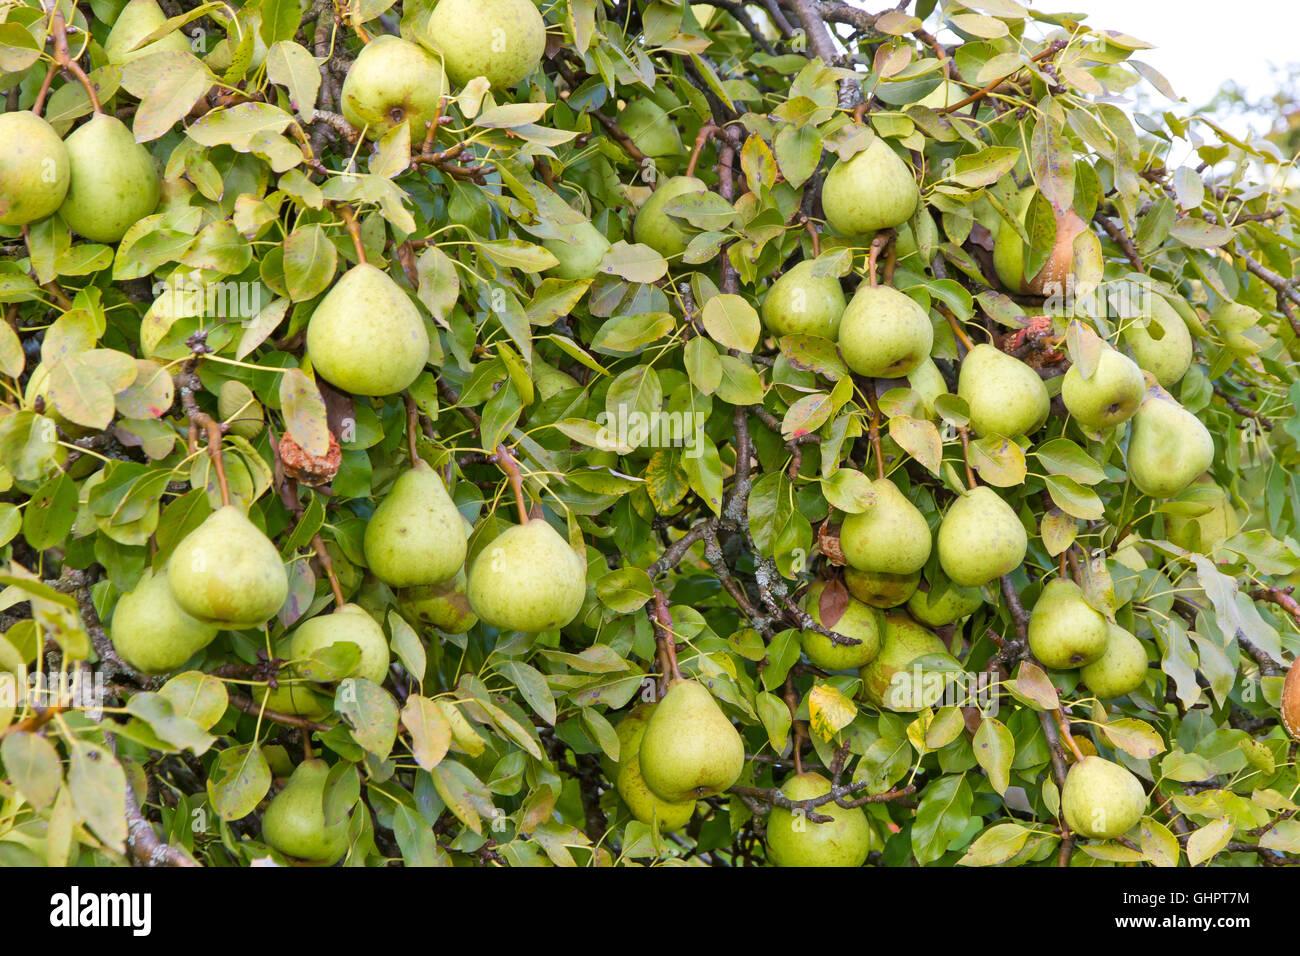 Fresh, organic pears on a tree - Stock Image